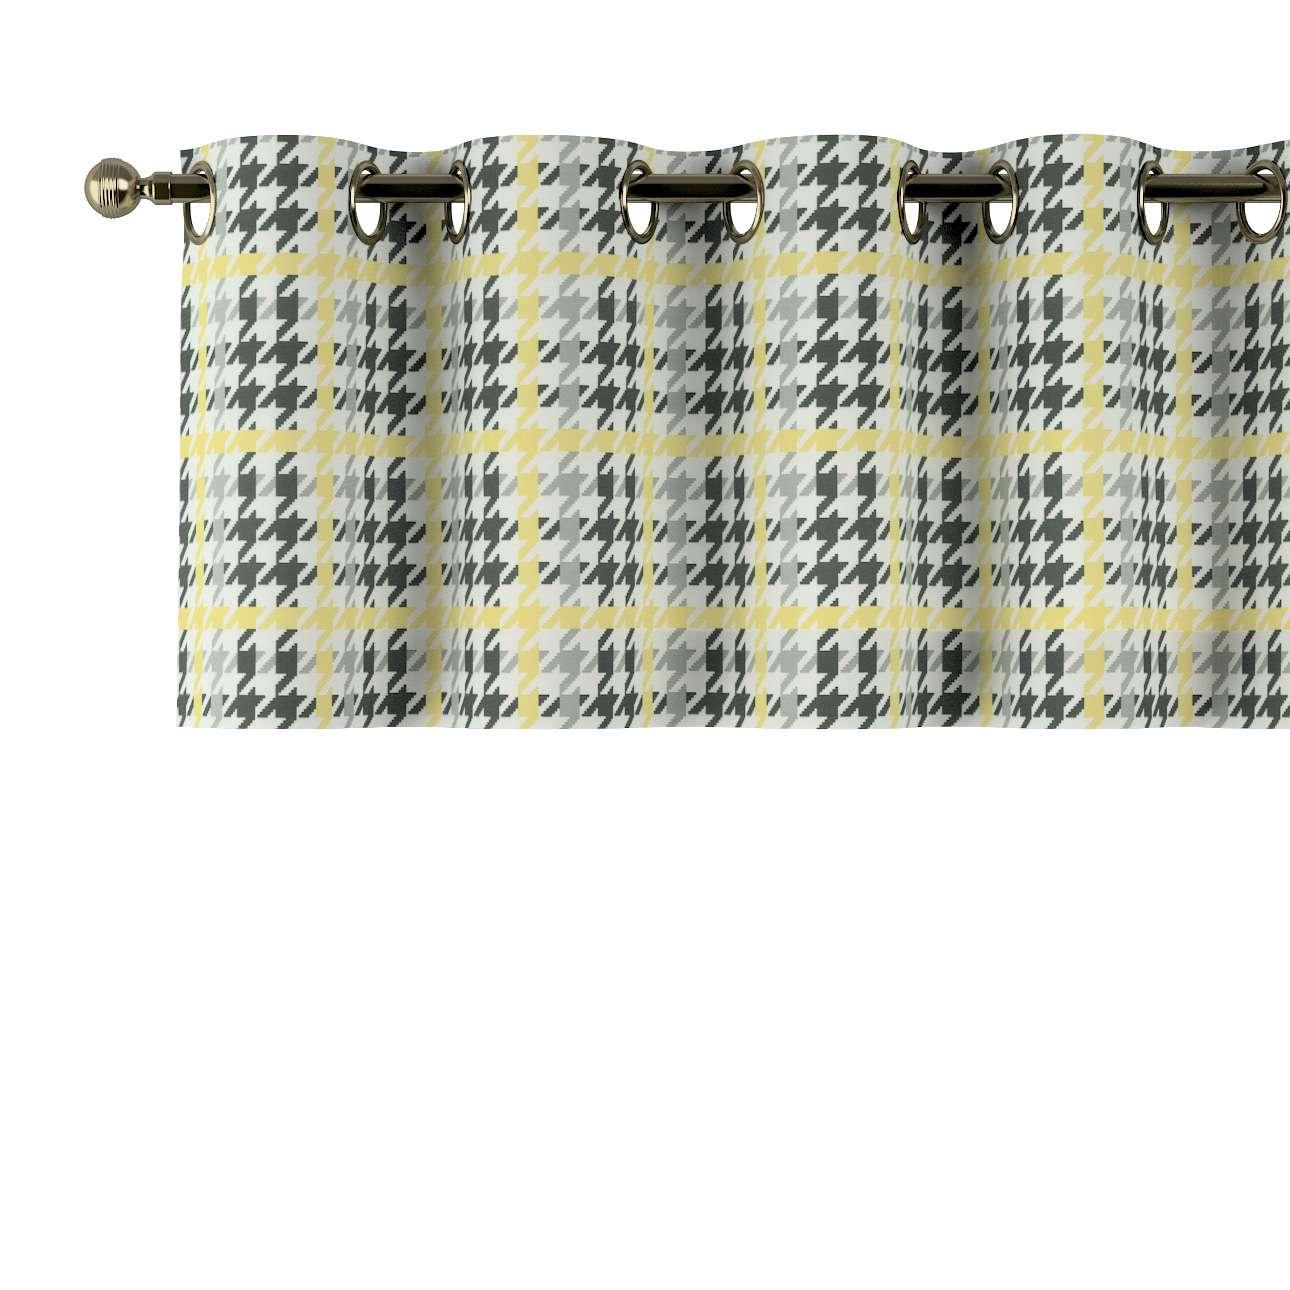 Lambrekin na kółkach 130x40cm w kolekcji Brooklyn, tkanina: 137-79